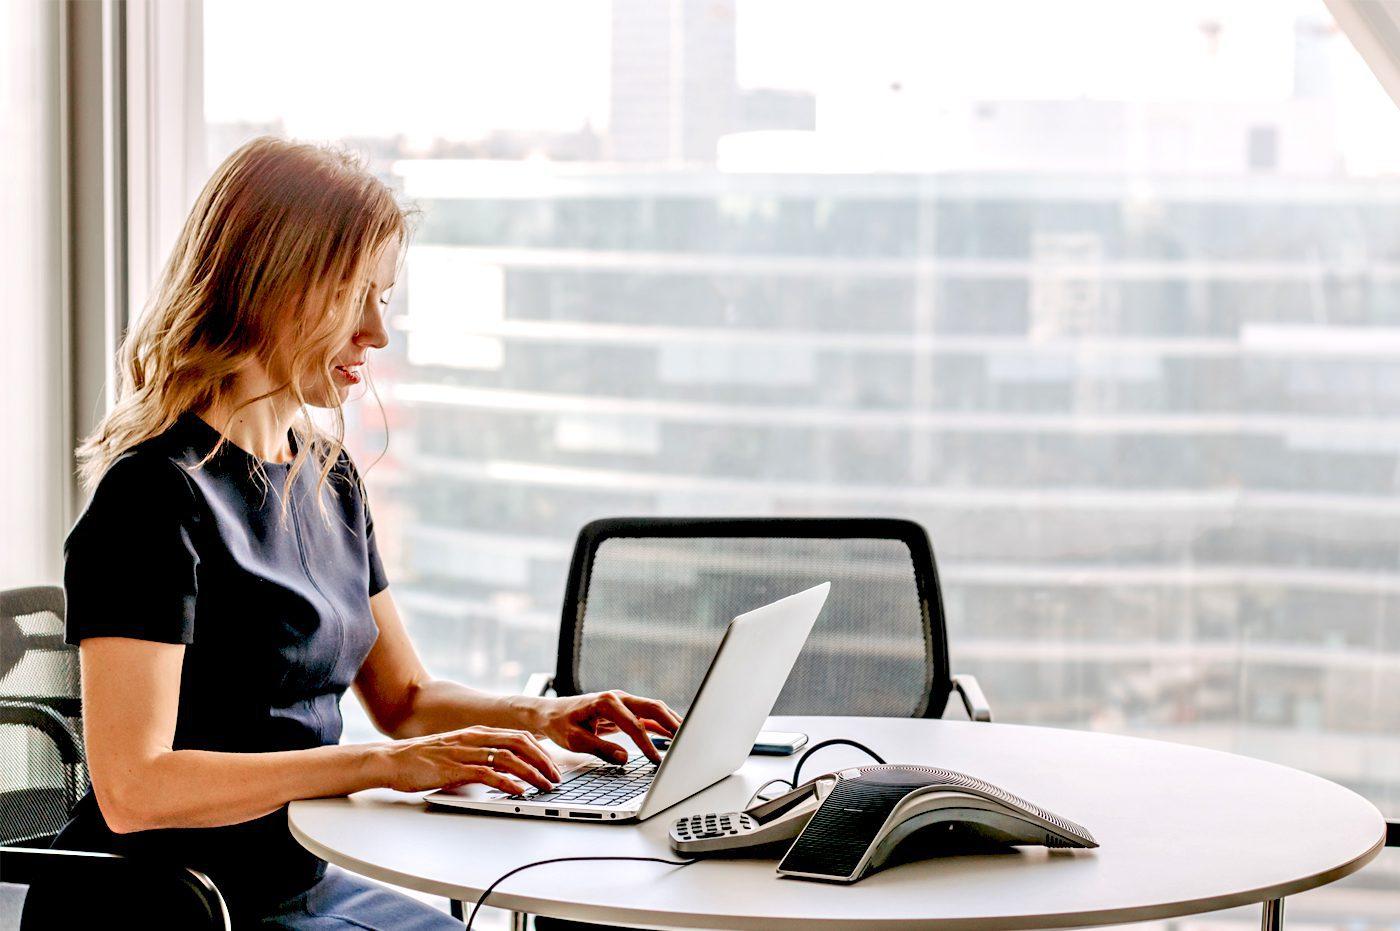 Online Prosci Change Management Certification Program (English)